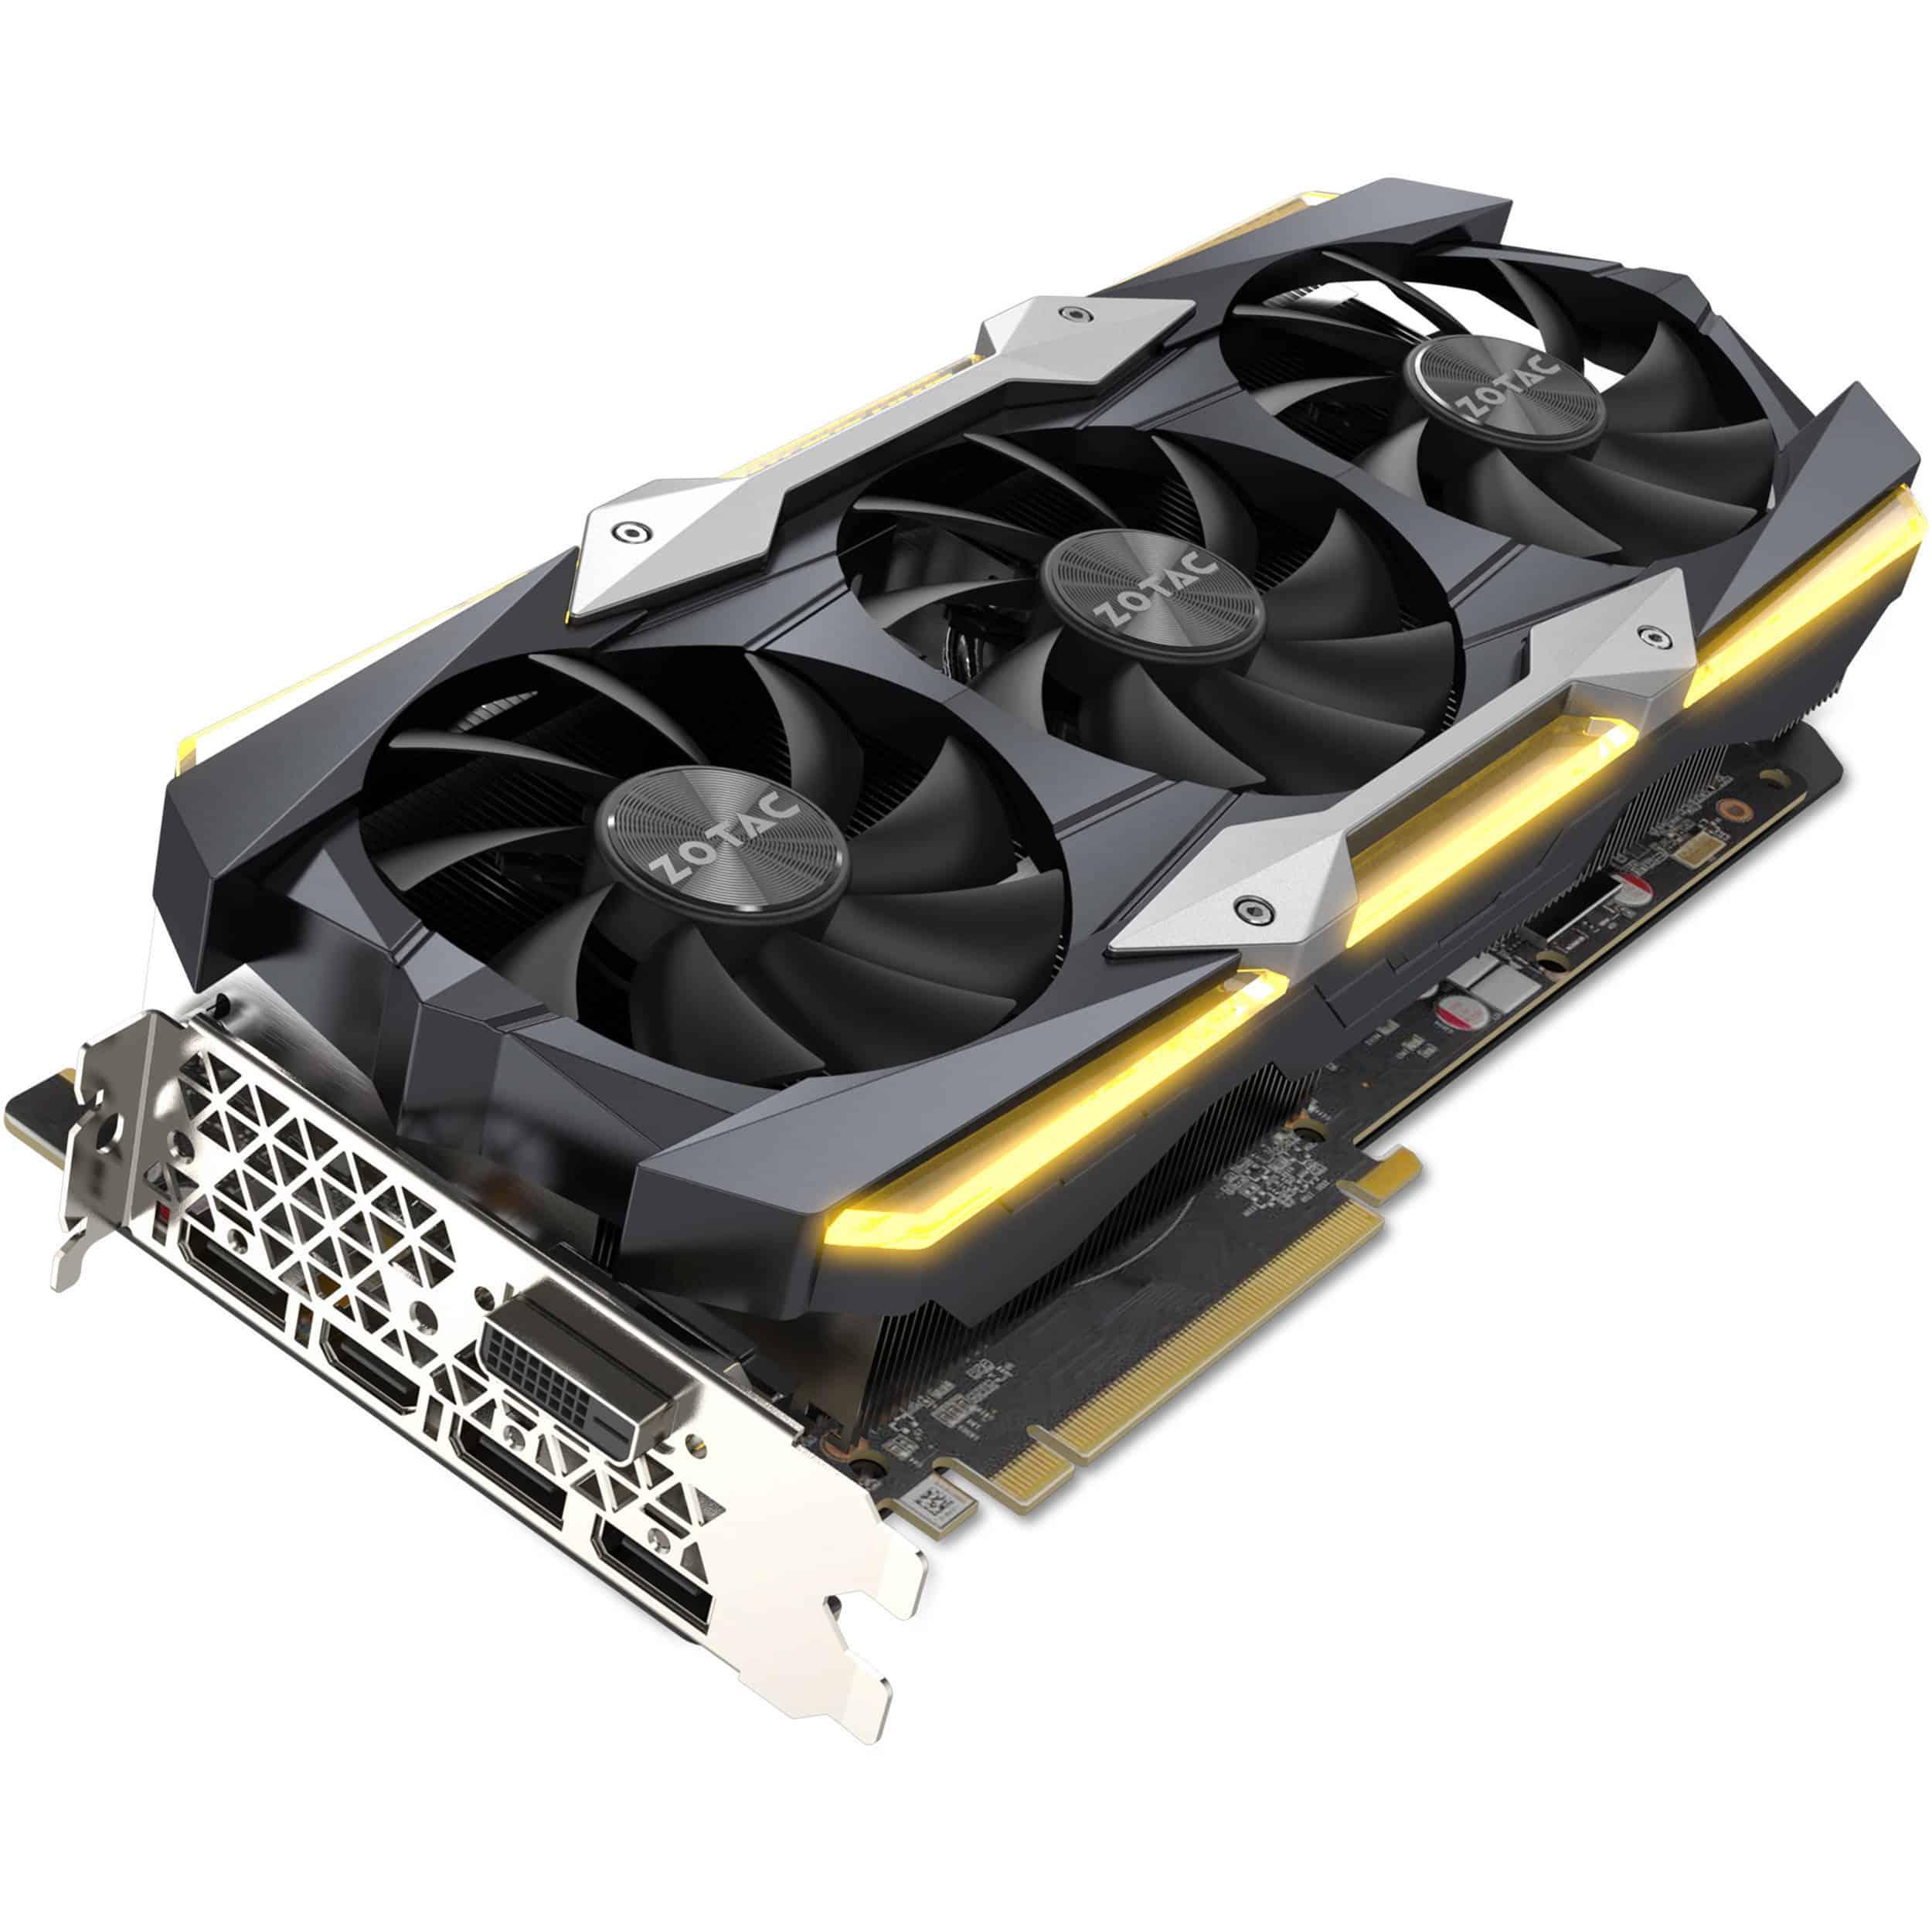 Zotac-GeForce-GTX-1080-Ti-AMP-Extreme-Core